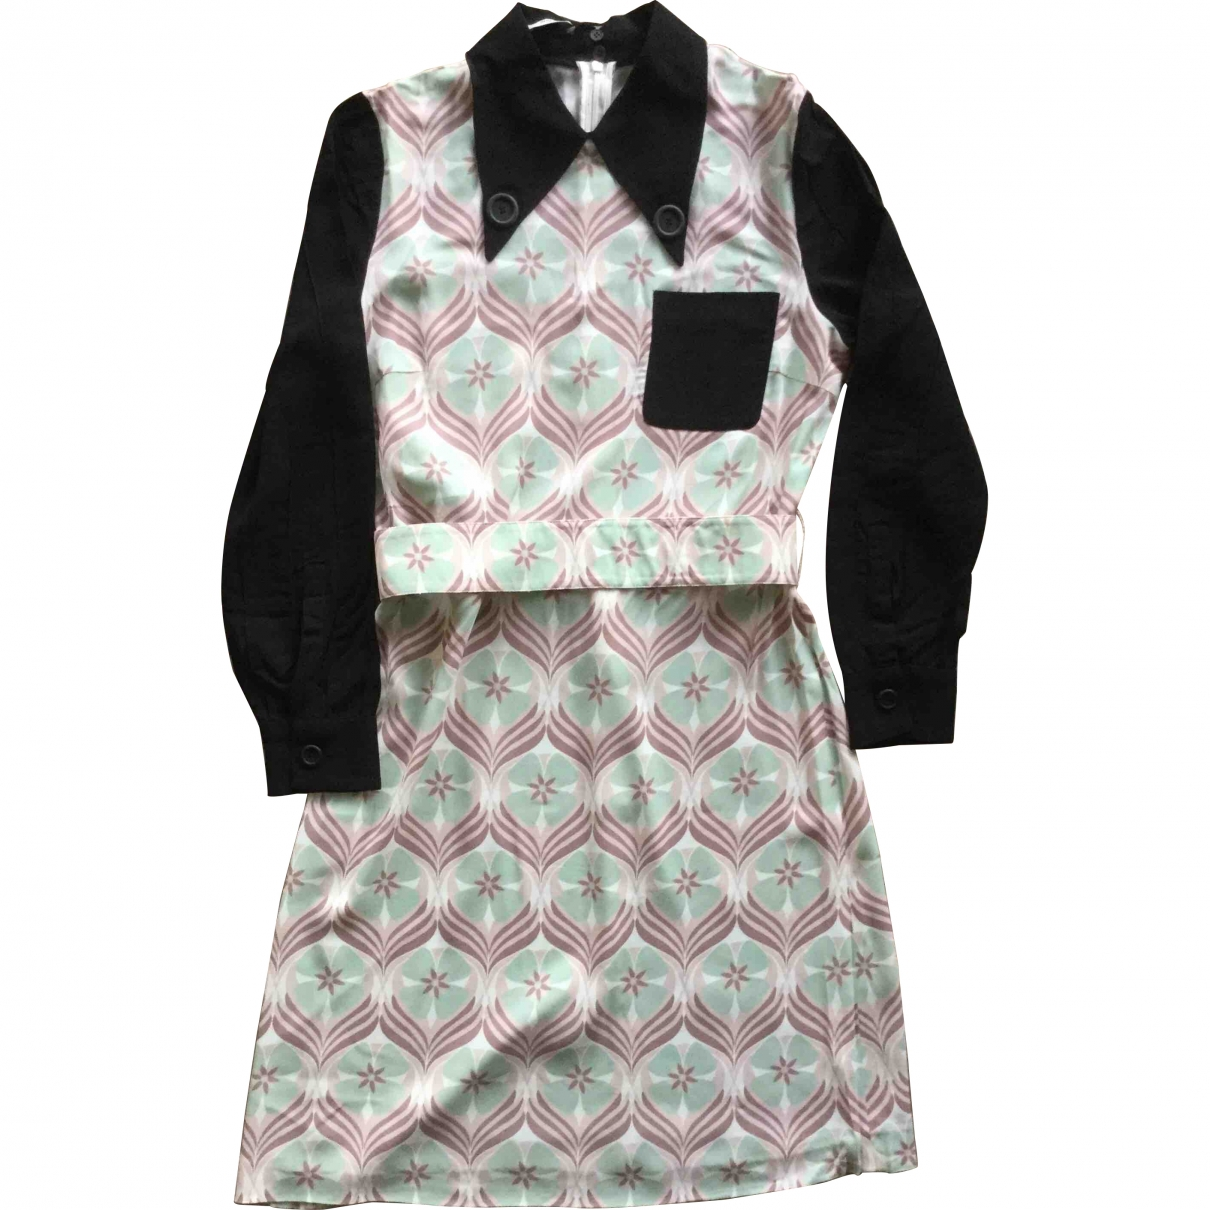 Miu Miu \N Multicolour dress for Women 40 IT